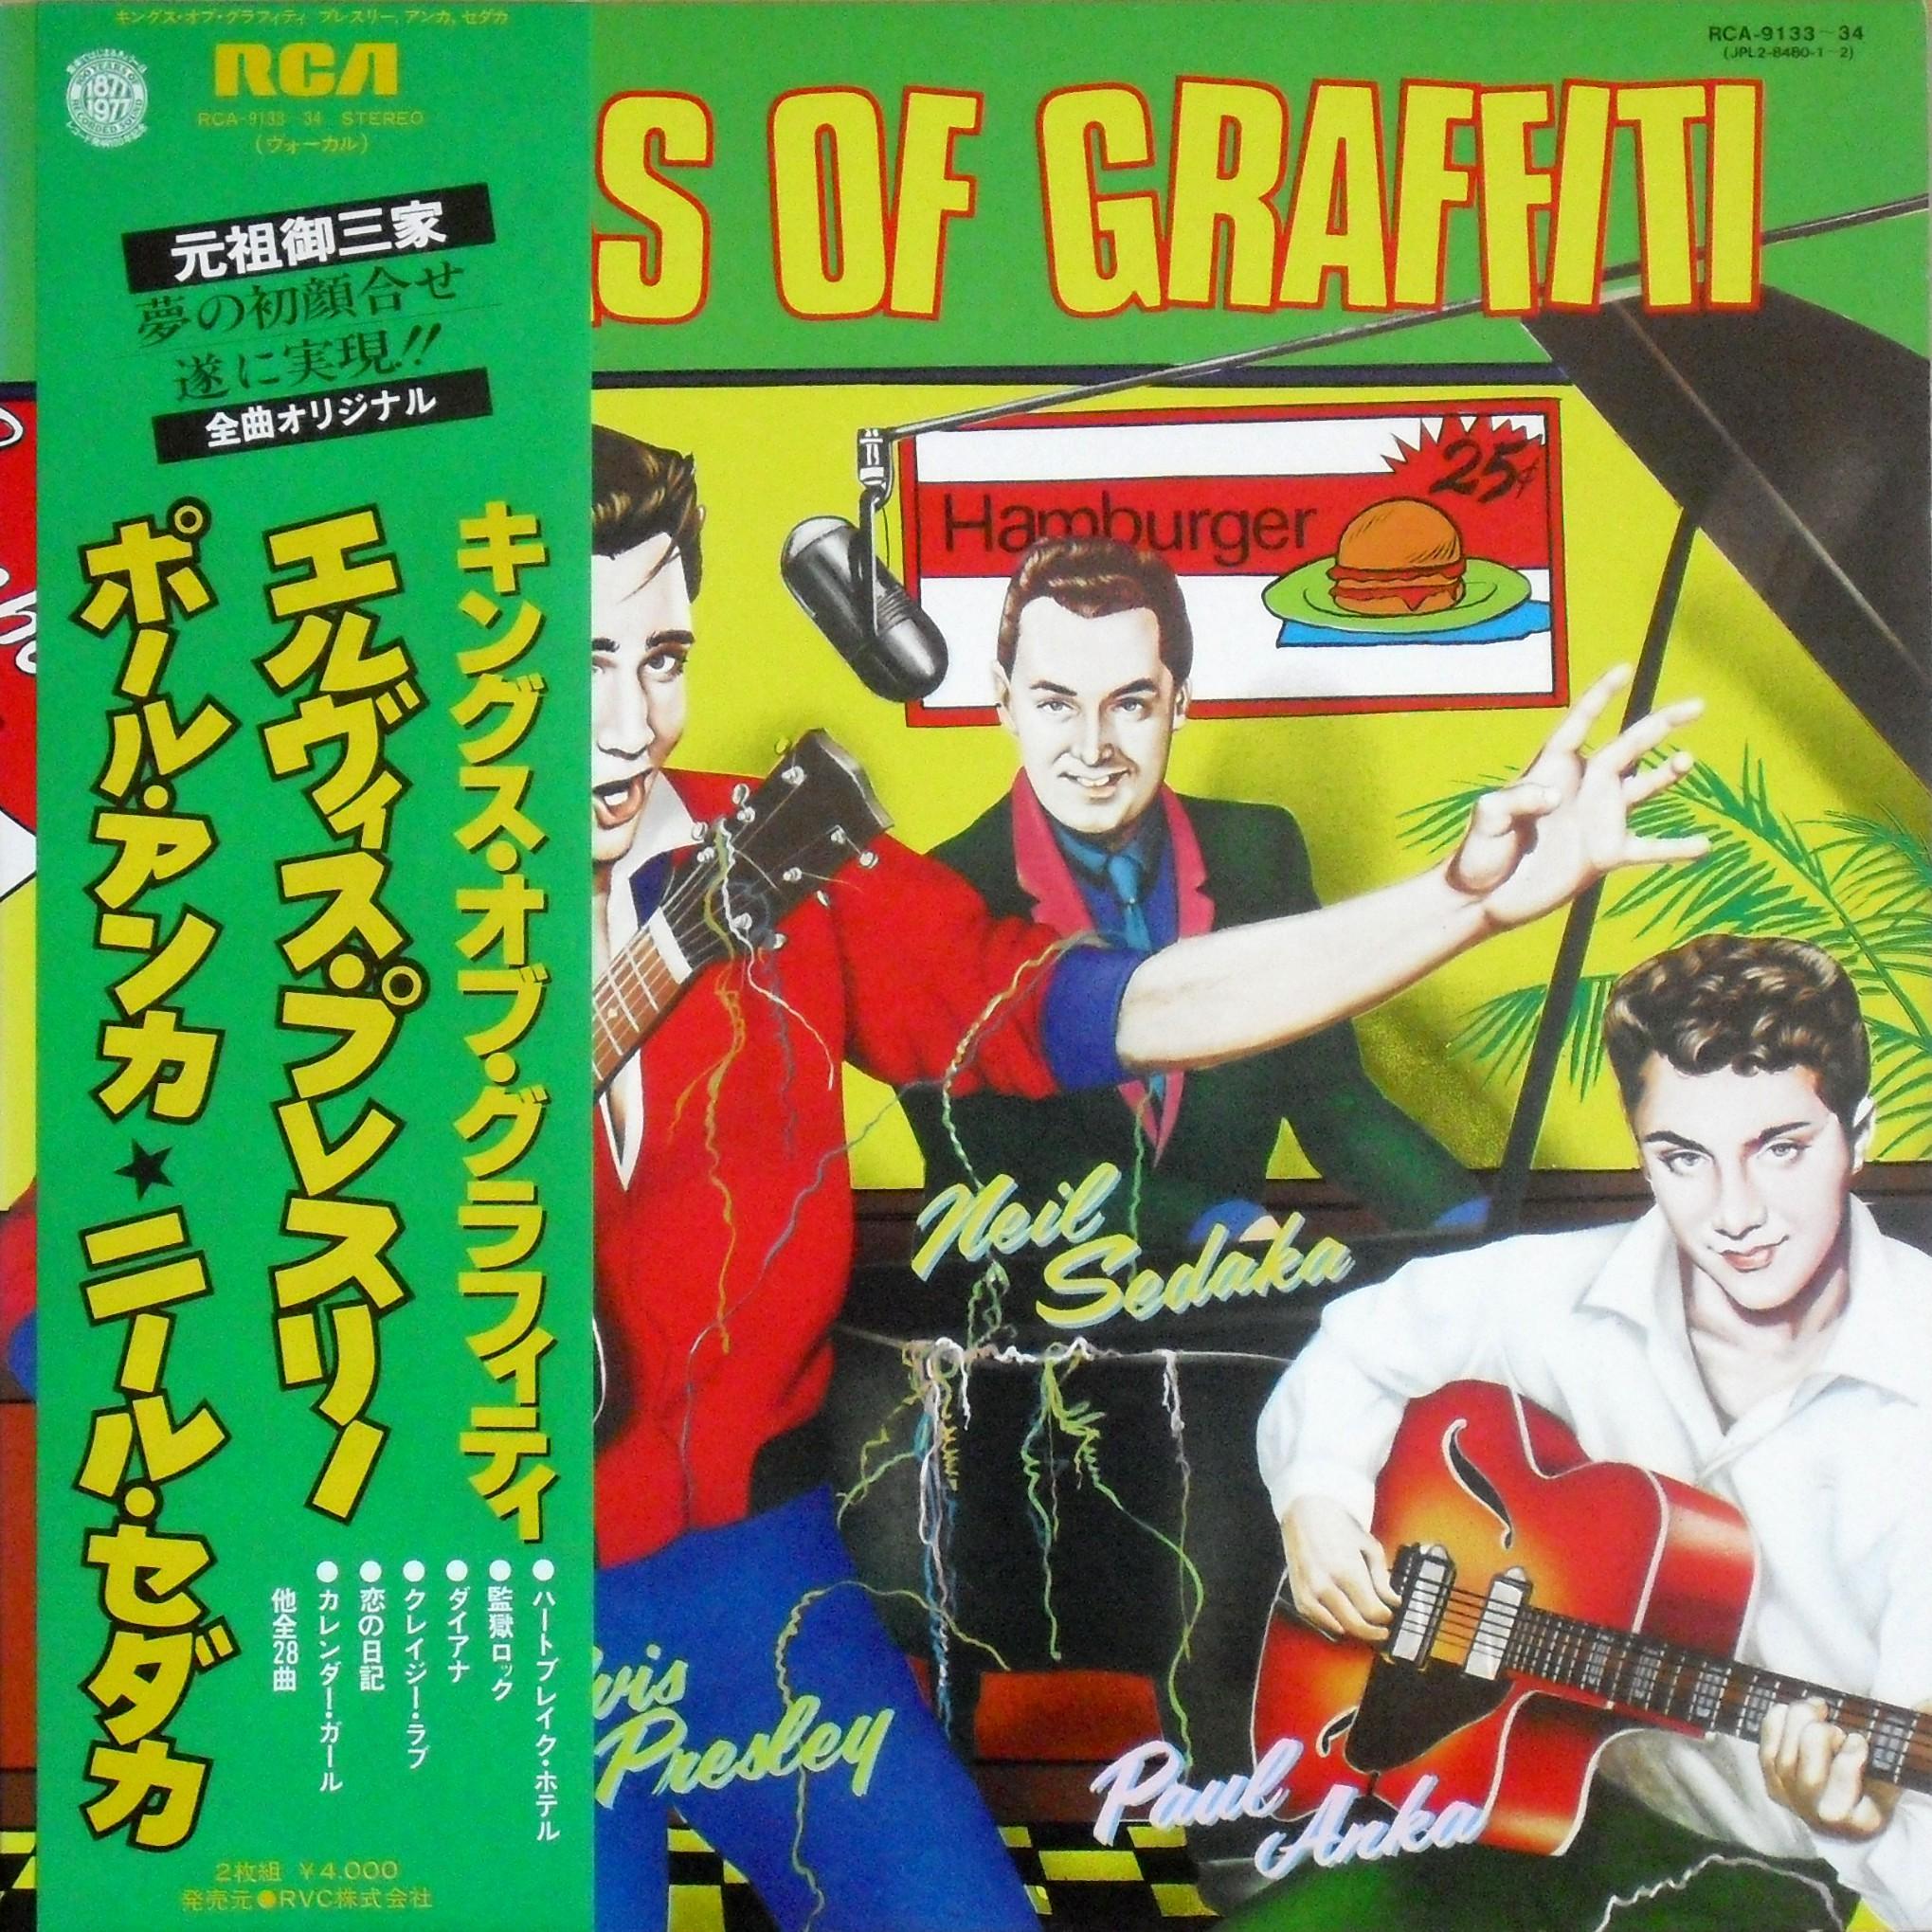 Diskografie Japan 1955 - 1977 Rca-91335xzxf